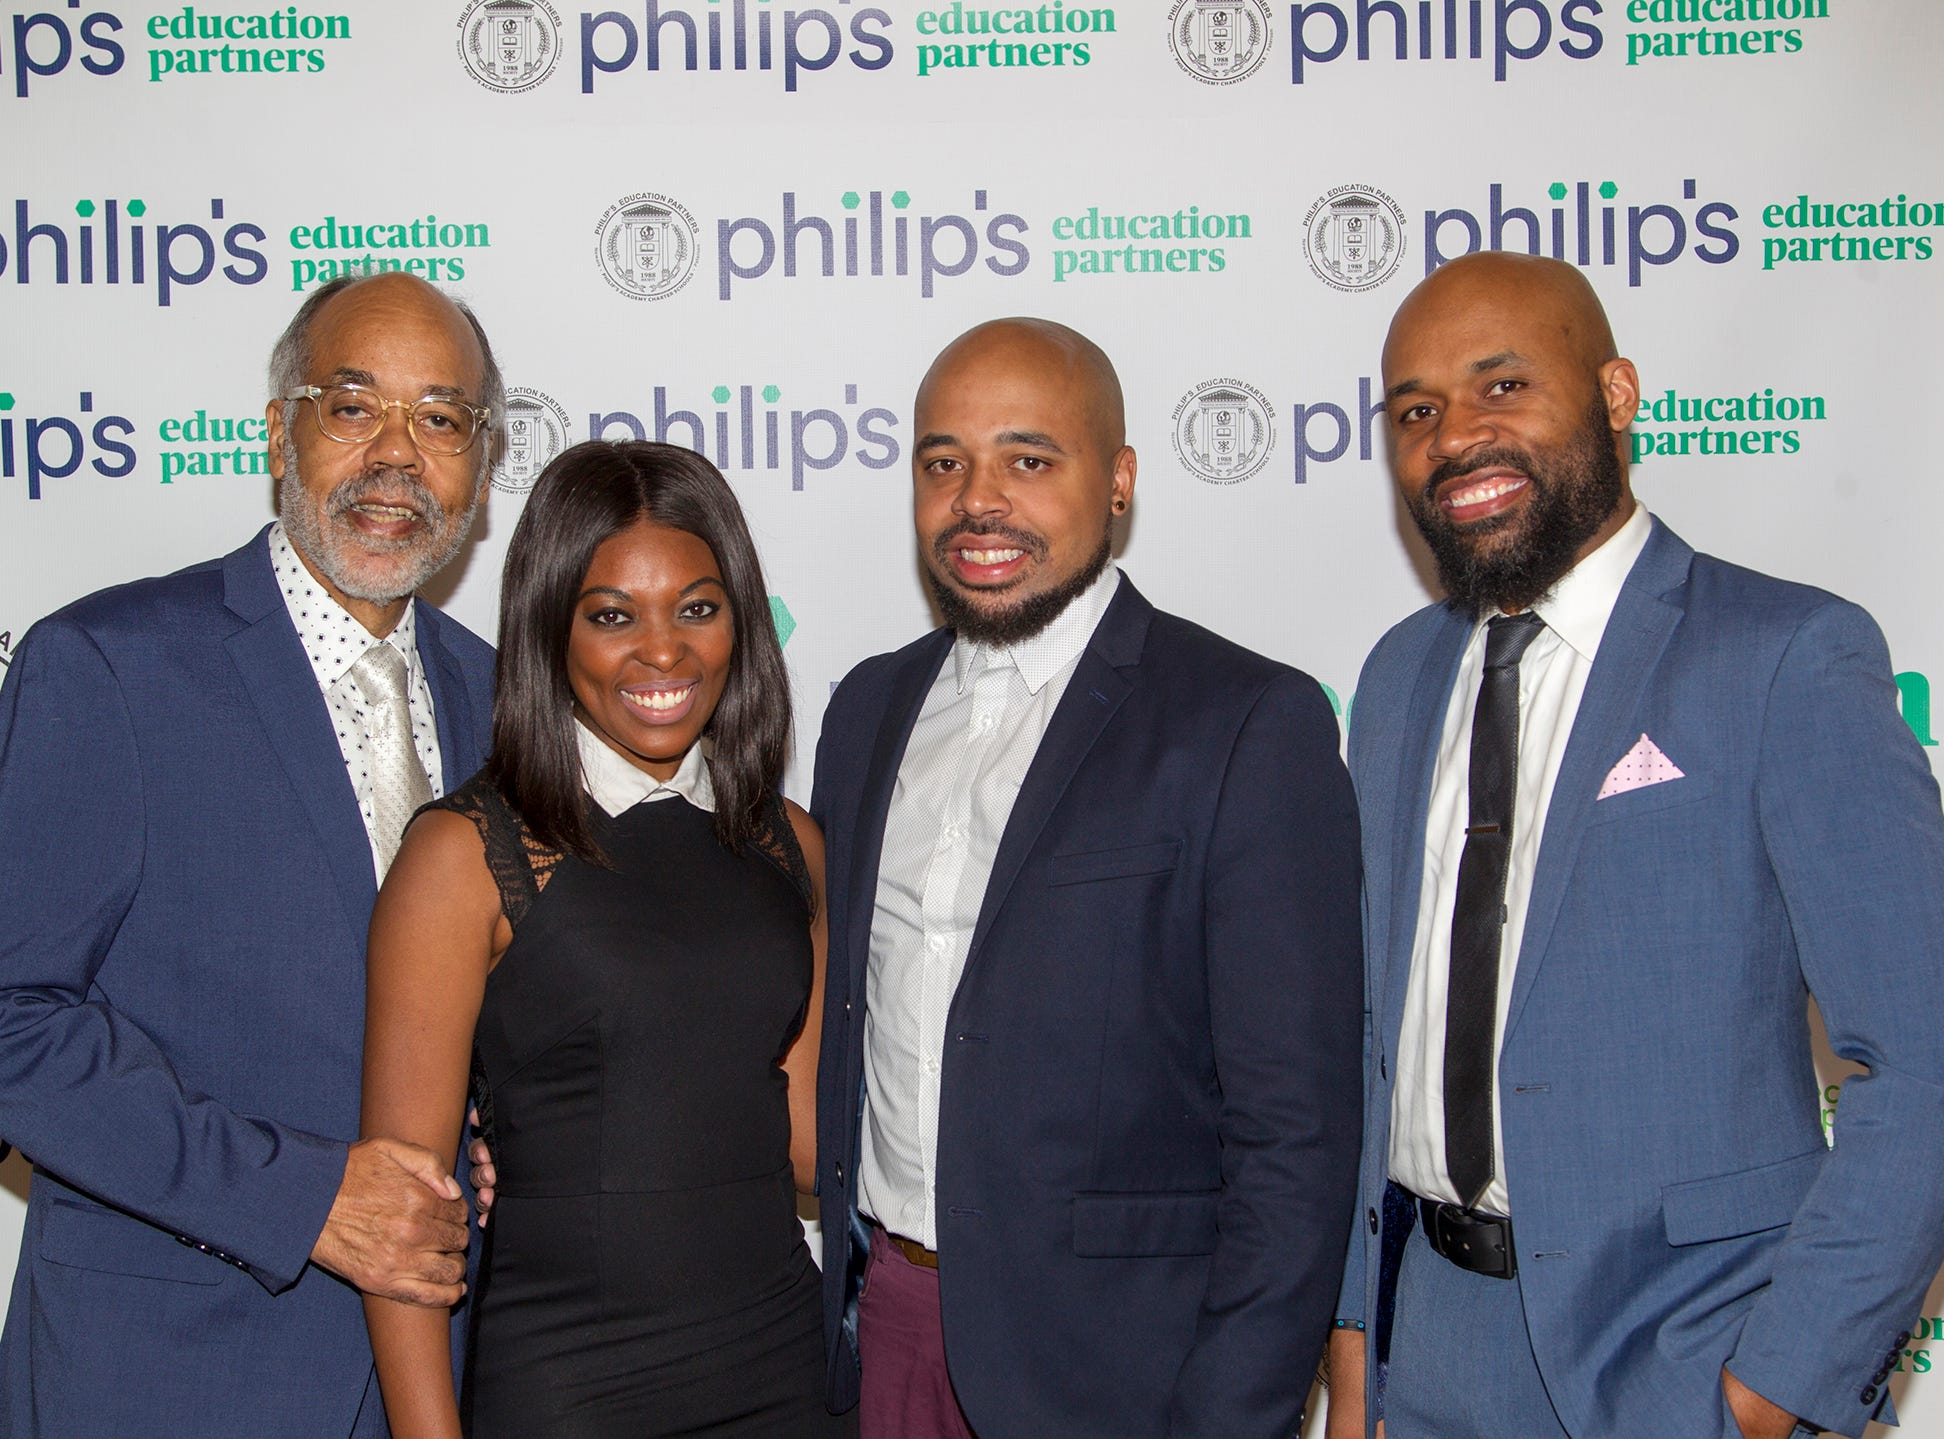 Glenn Rogers, Tahnia Hawkins, Brandon Rogers, Daren Rogers. Philip's Education Partners host The Dream Maker 30th anniversary gala at The Mezzanine in Newark 3/29/2019.